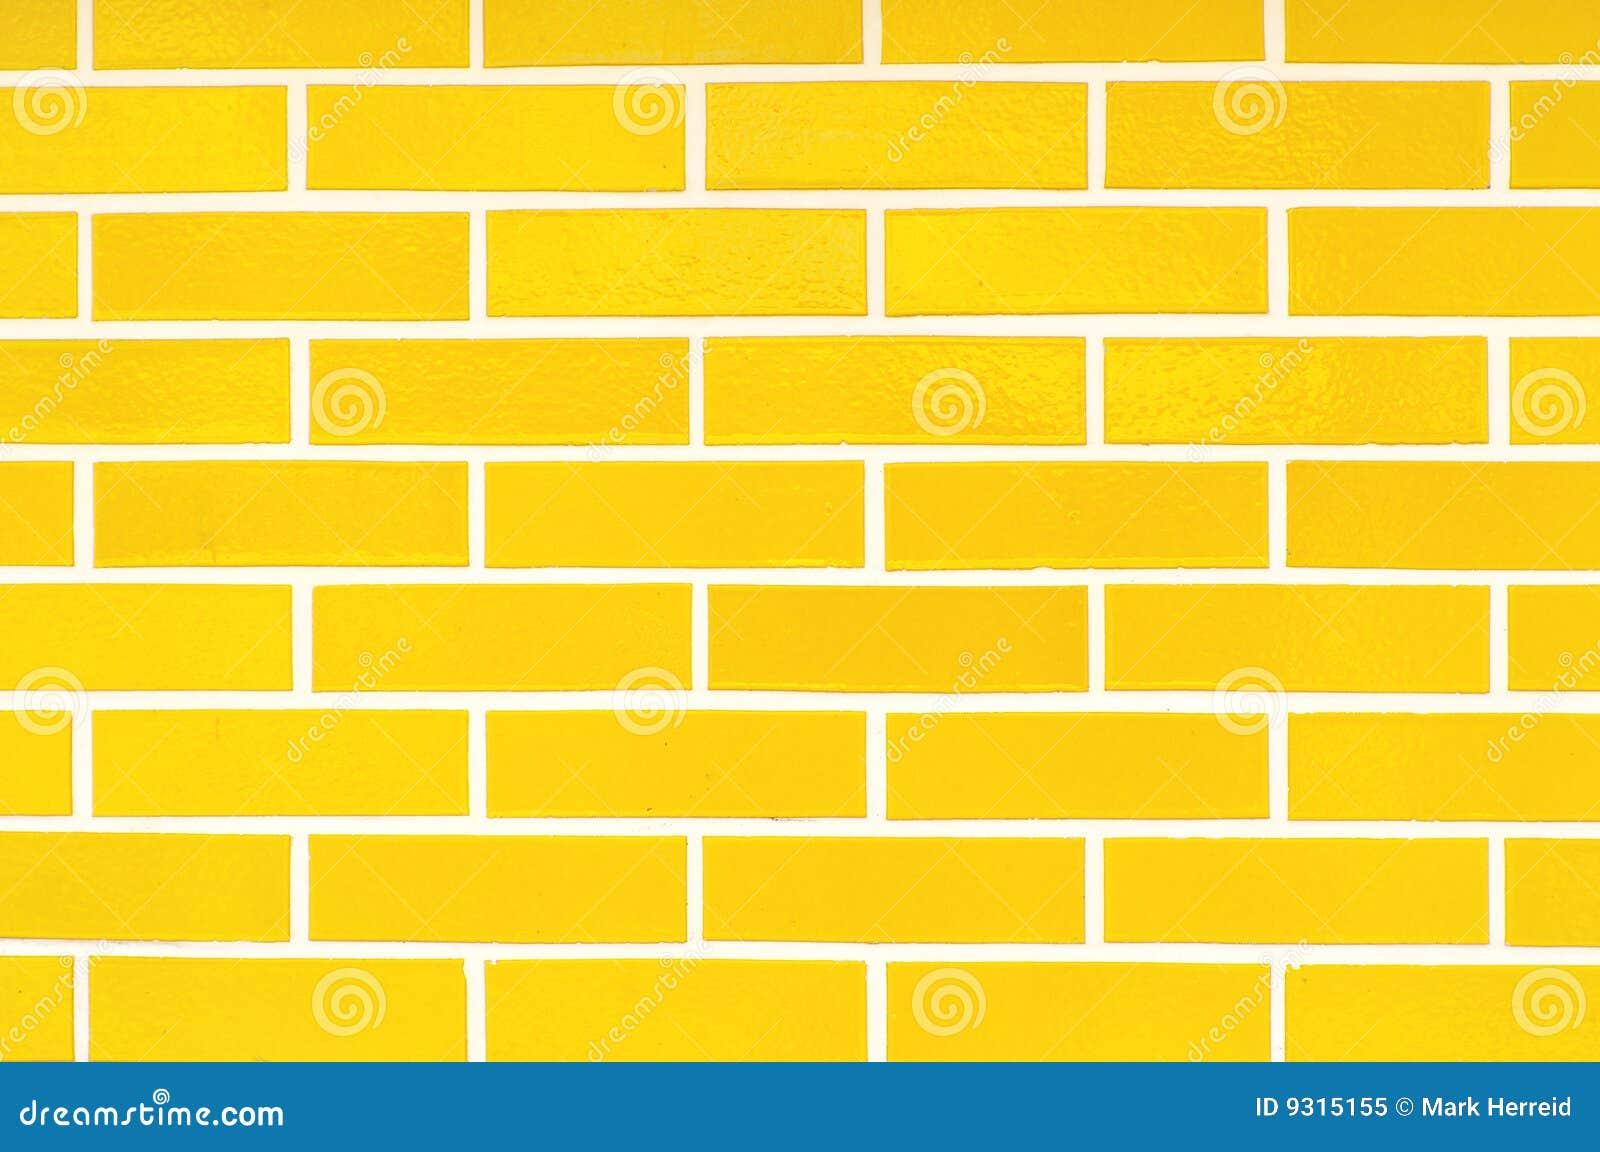 Photo image bricks brick masonry bricks wall background texture - Porcelain Yellow Bricks Pattern For Background Royalty